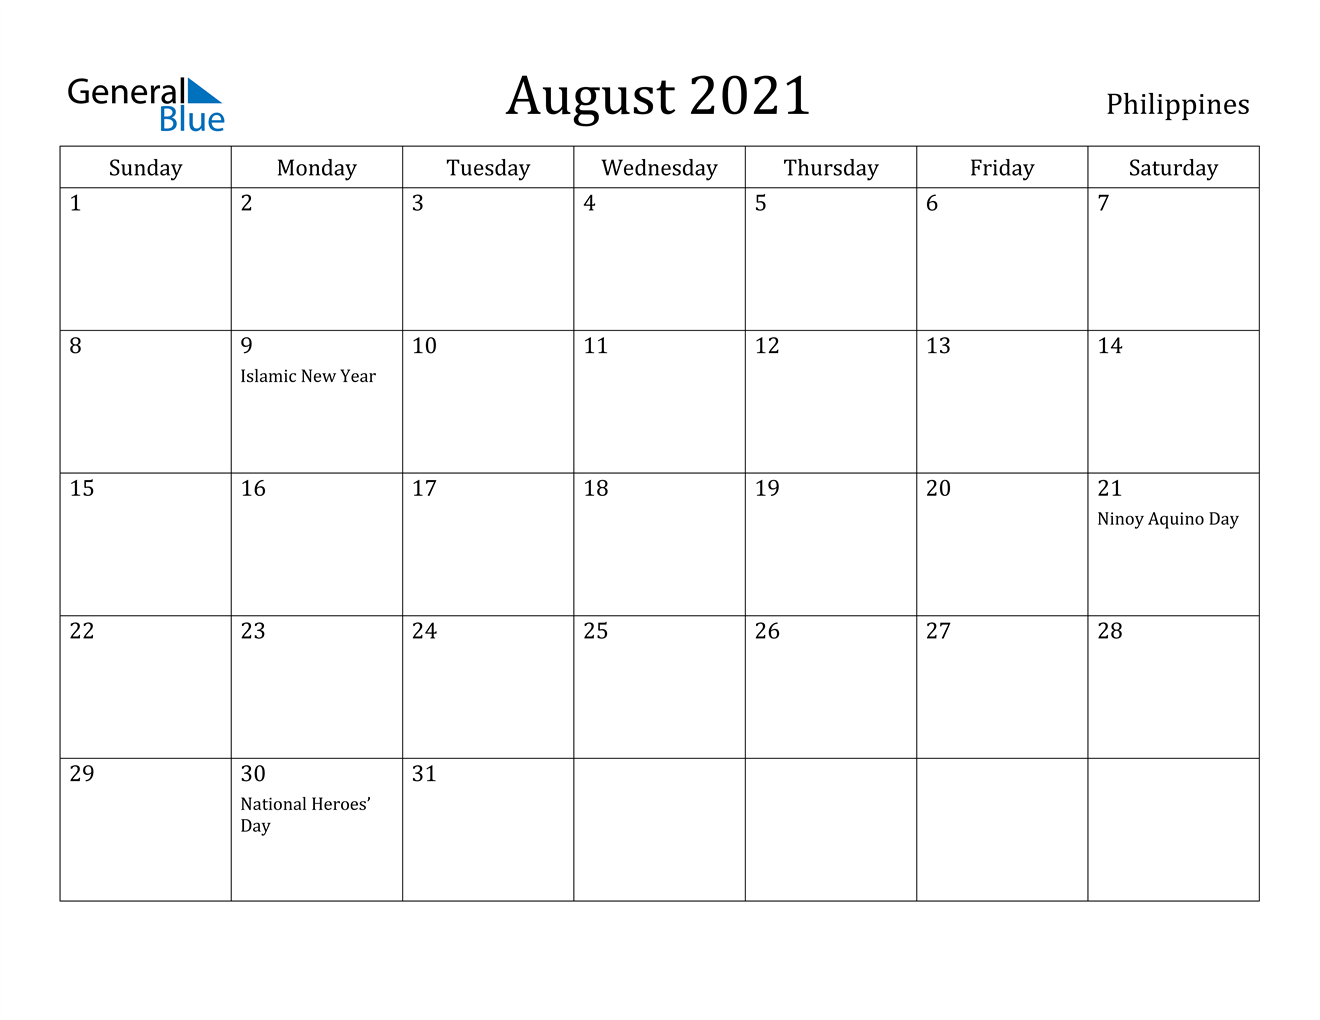 August 2021 Calendar - Philippines